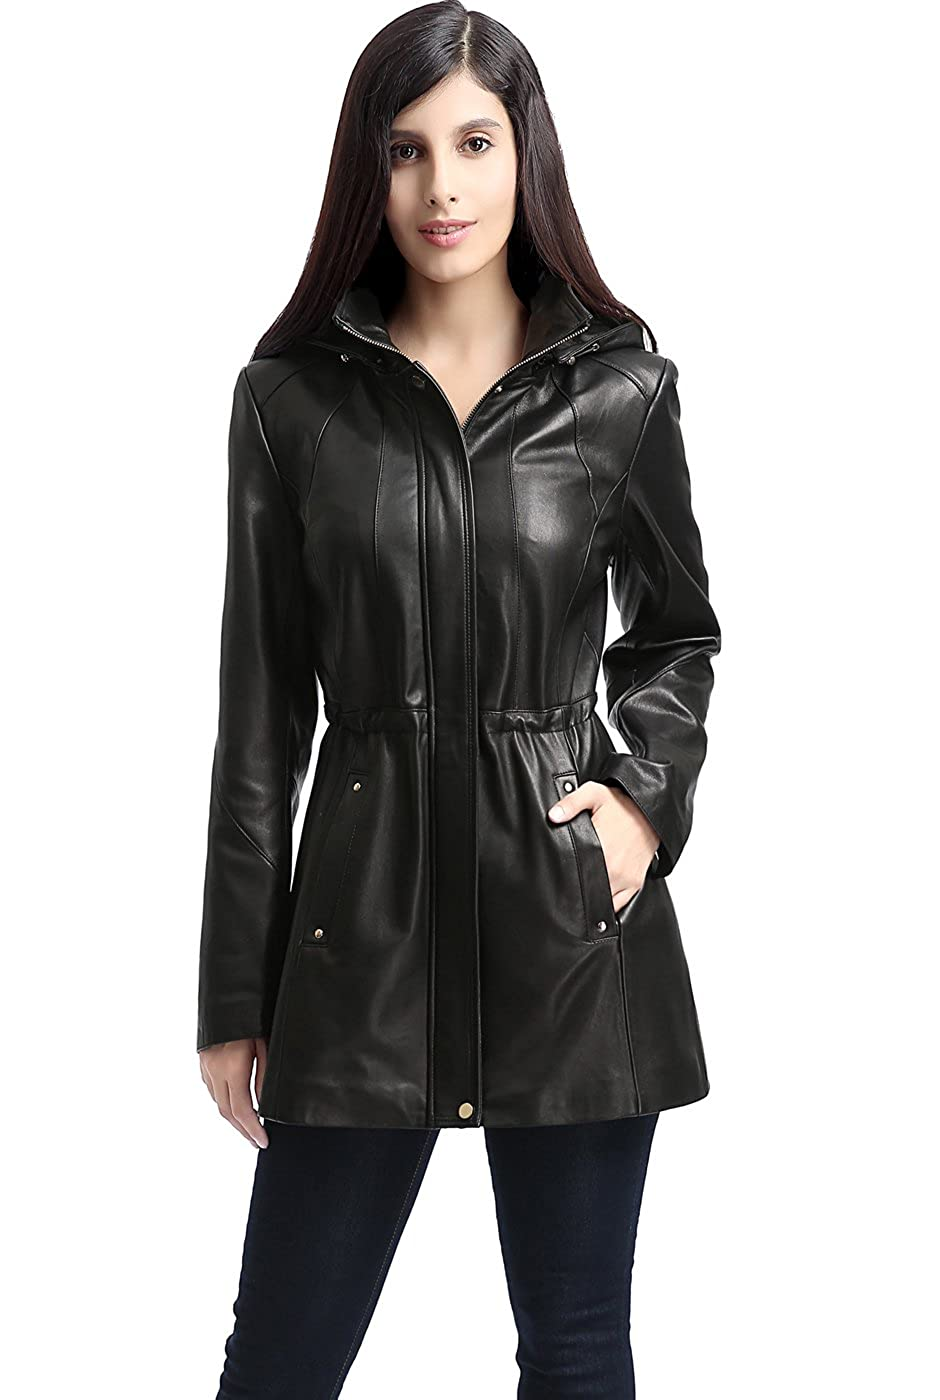 Regular and Plus Size and Short BGSD Womens Natalie Lambskin Leather Anorak Coat